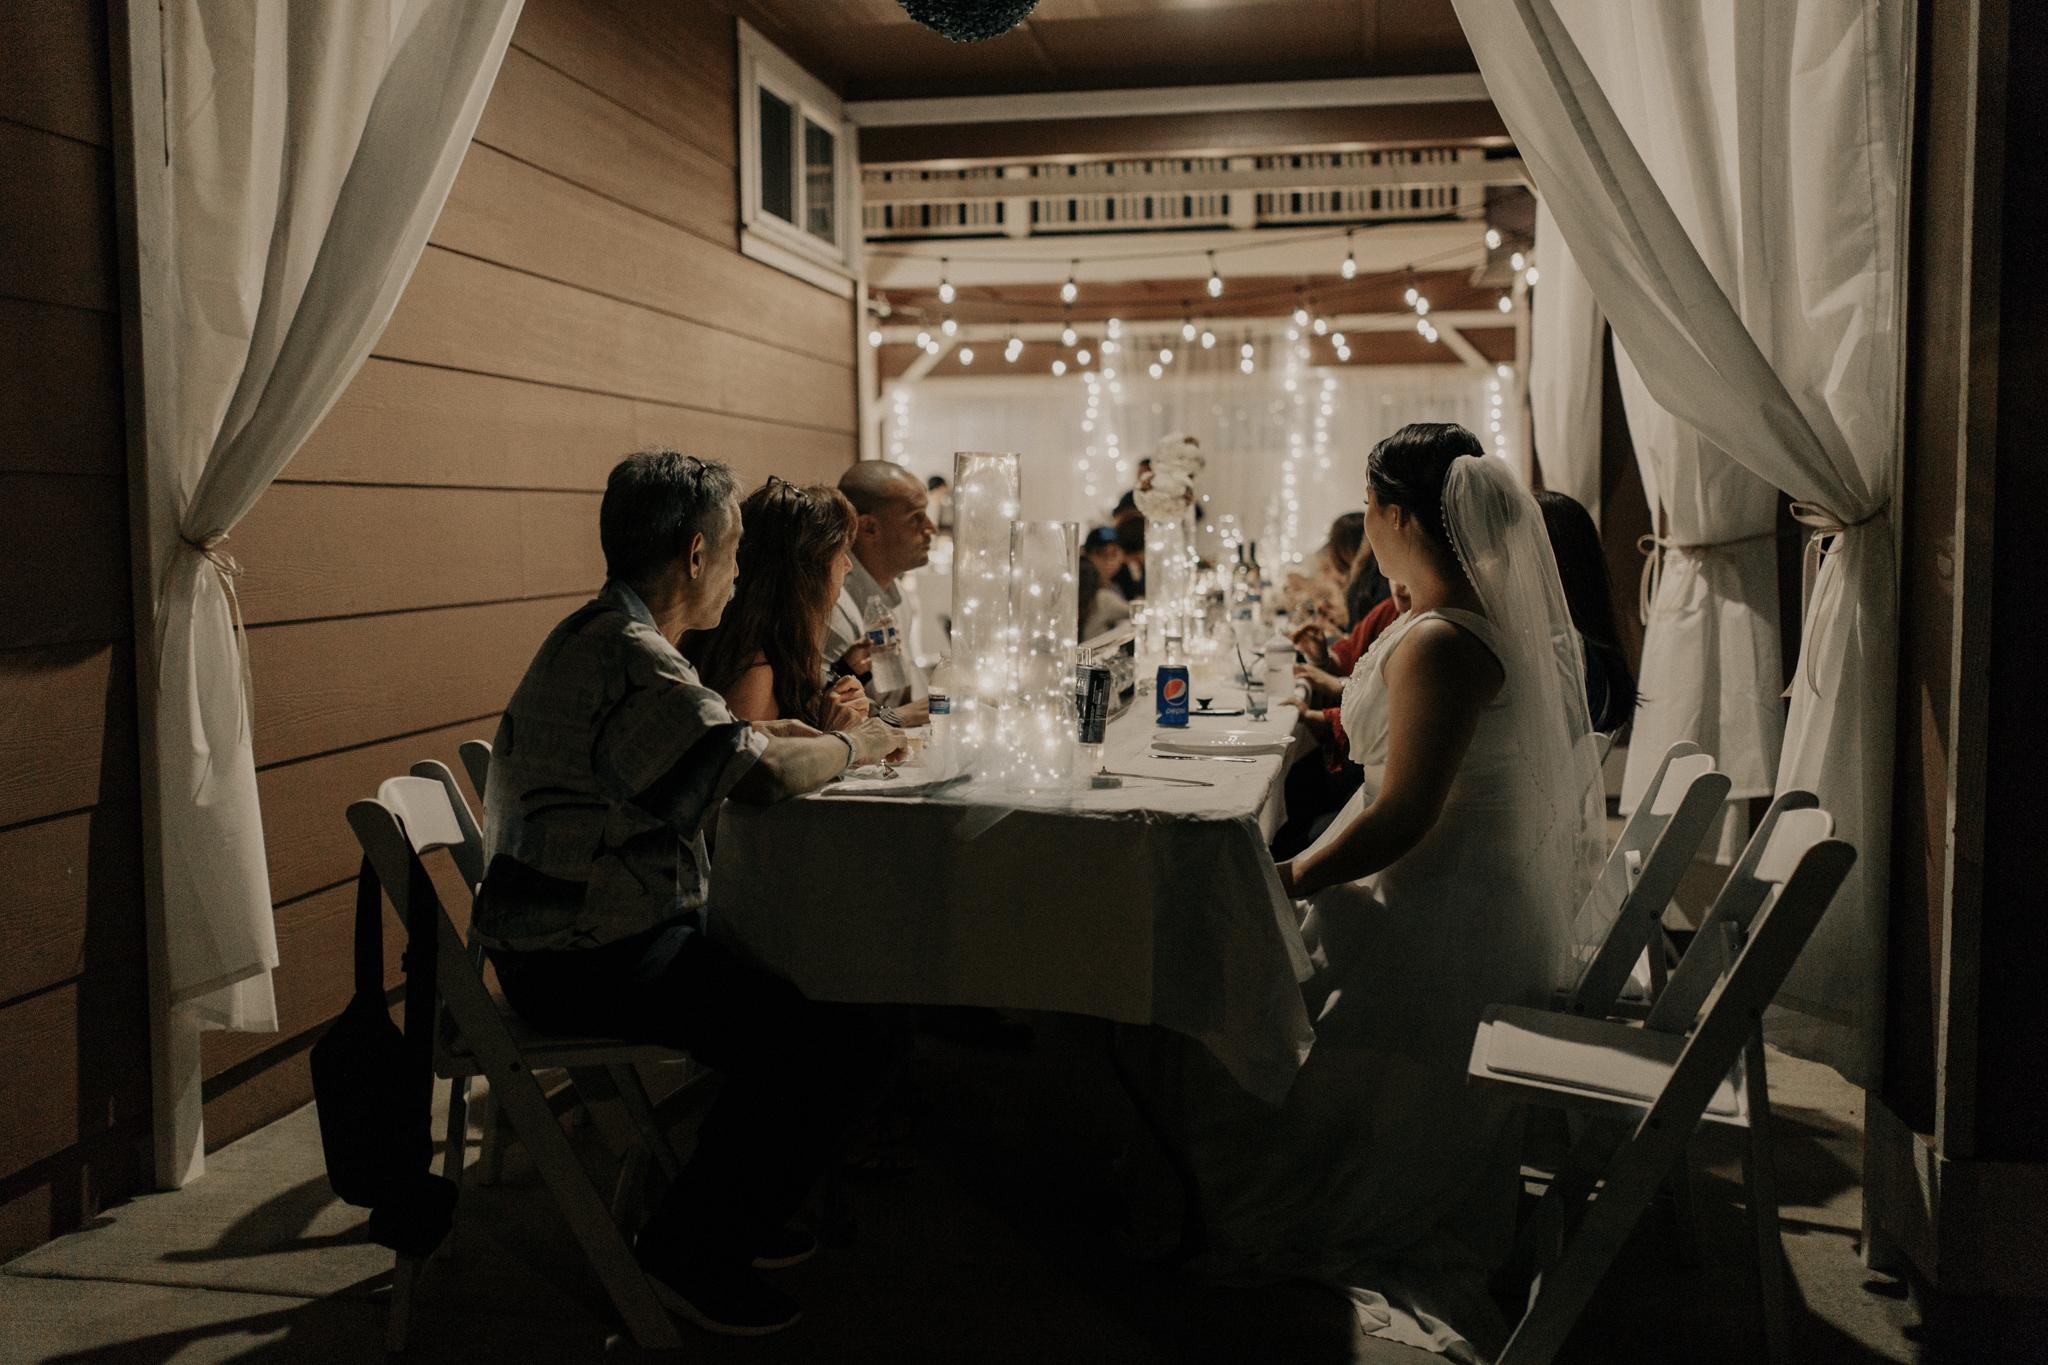 Backyard wedding idea